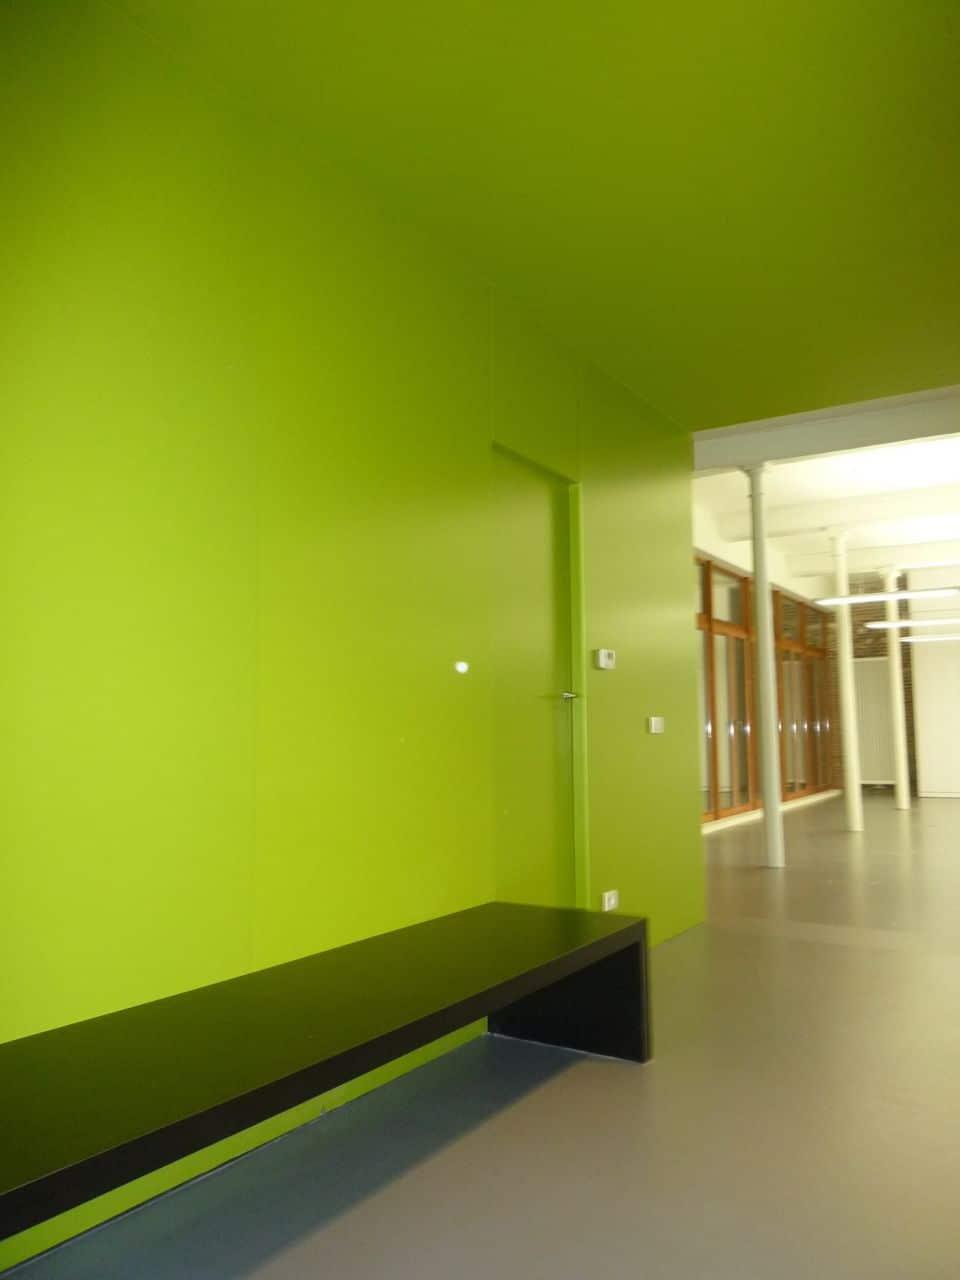 P1060776 | Baeyens & Beck architecten Gent | architect nieuwbouw renovatie interieur | high end | architectenbureau